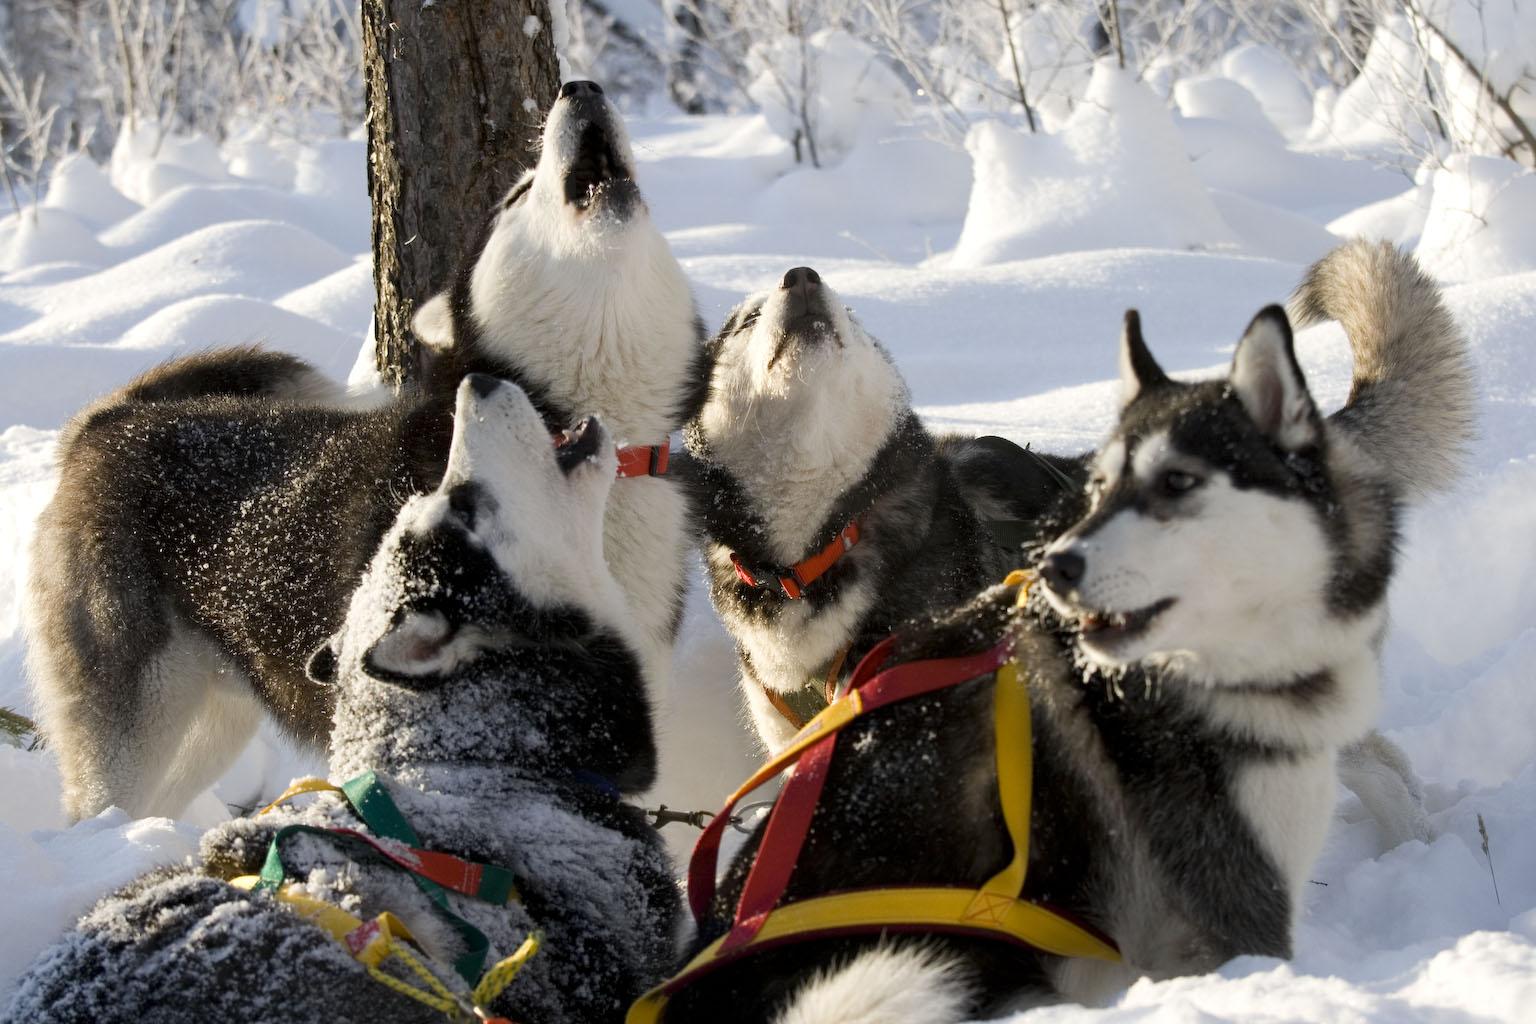 Fun-loving & friendly huskies